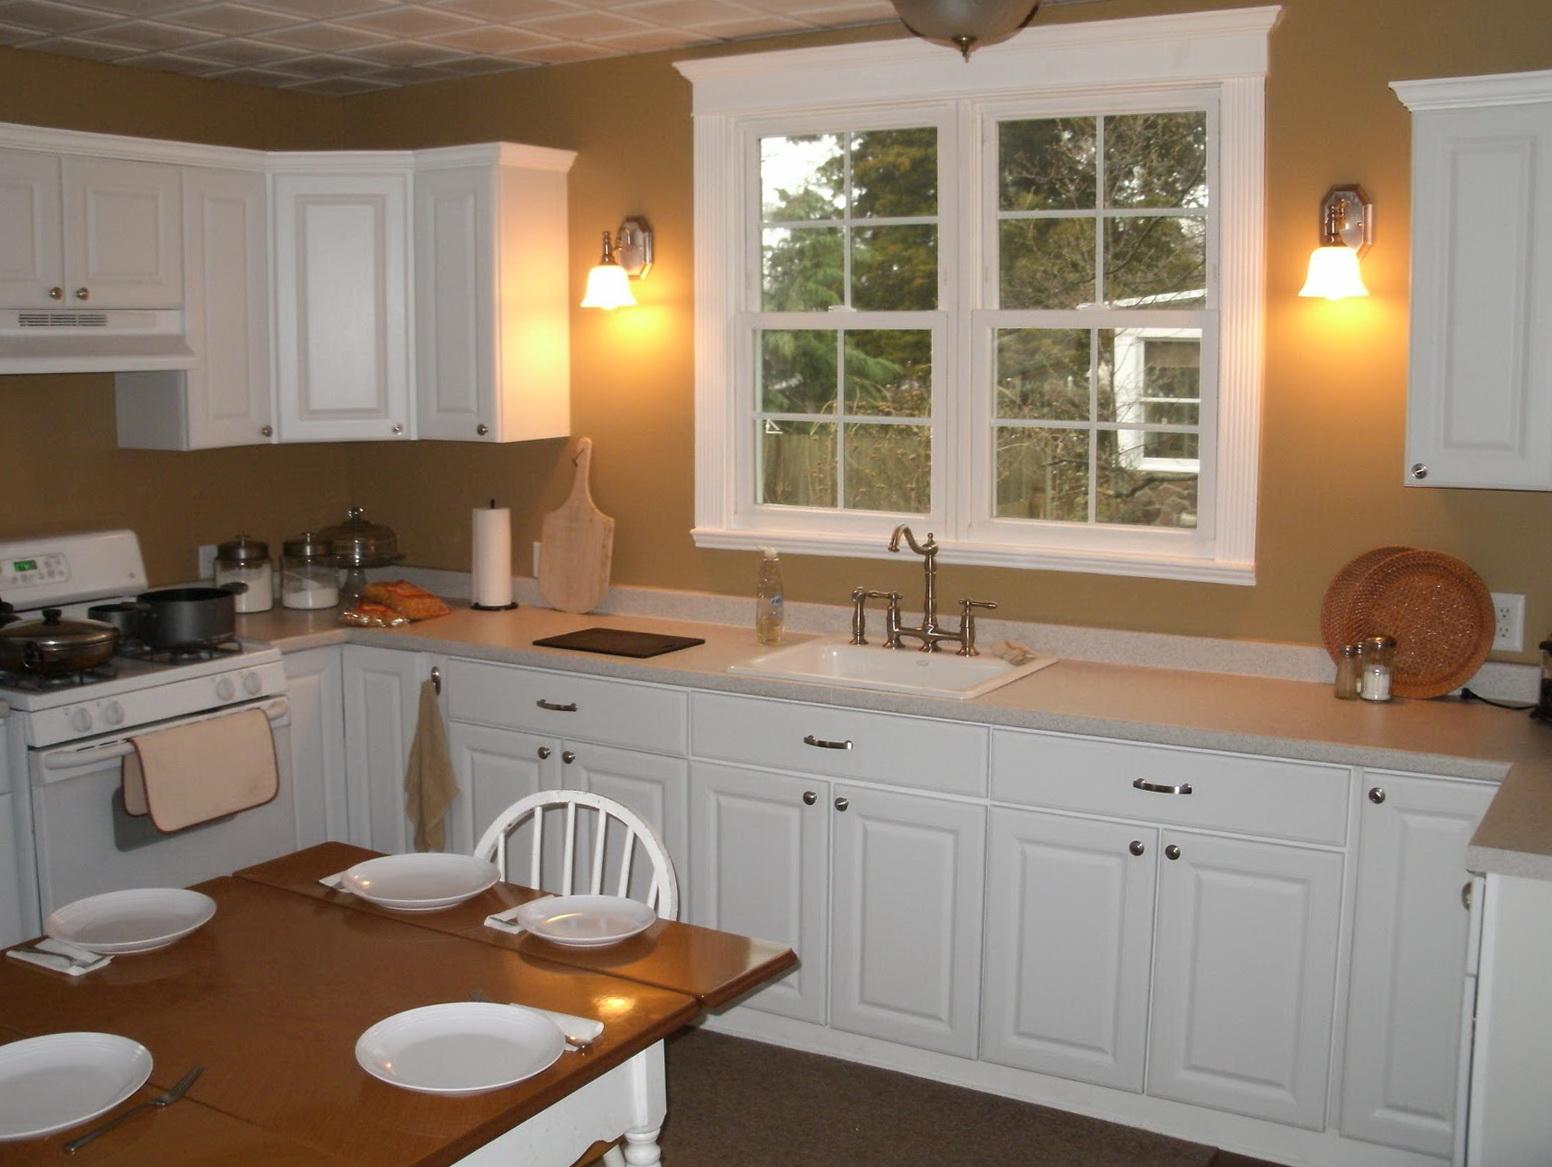 Kitchen Remodel Cost Average